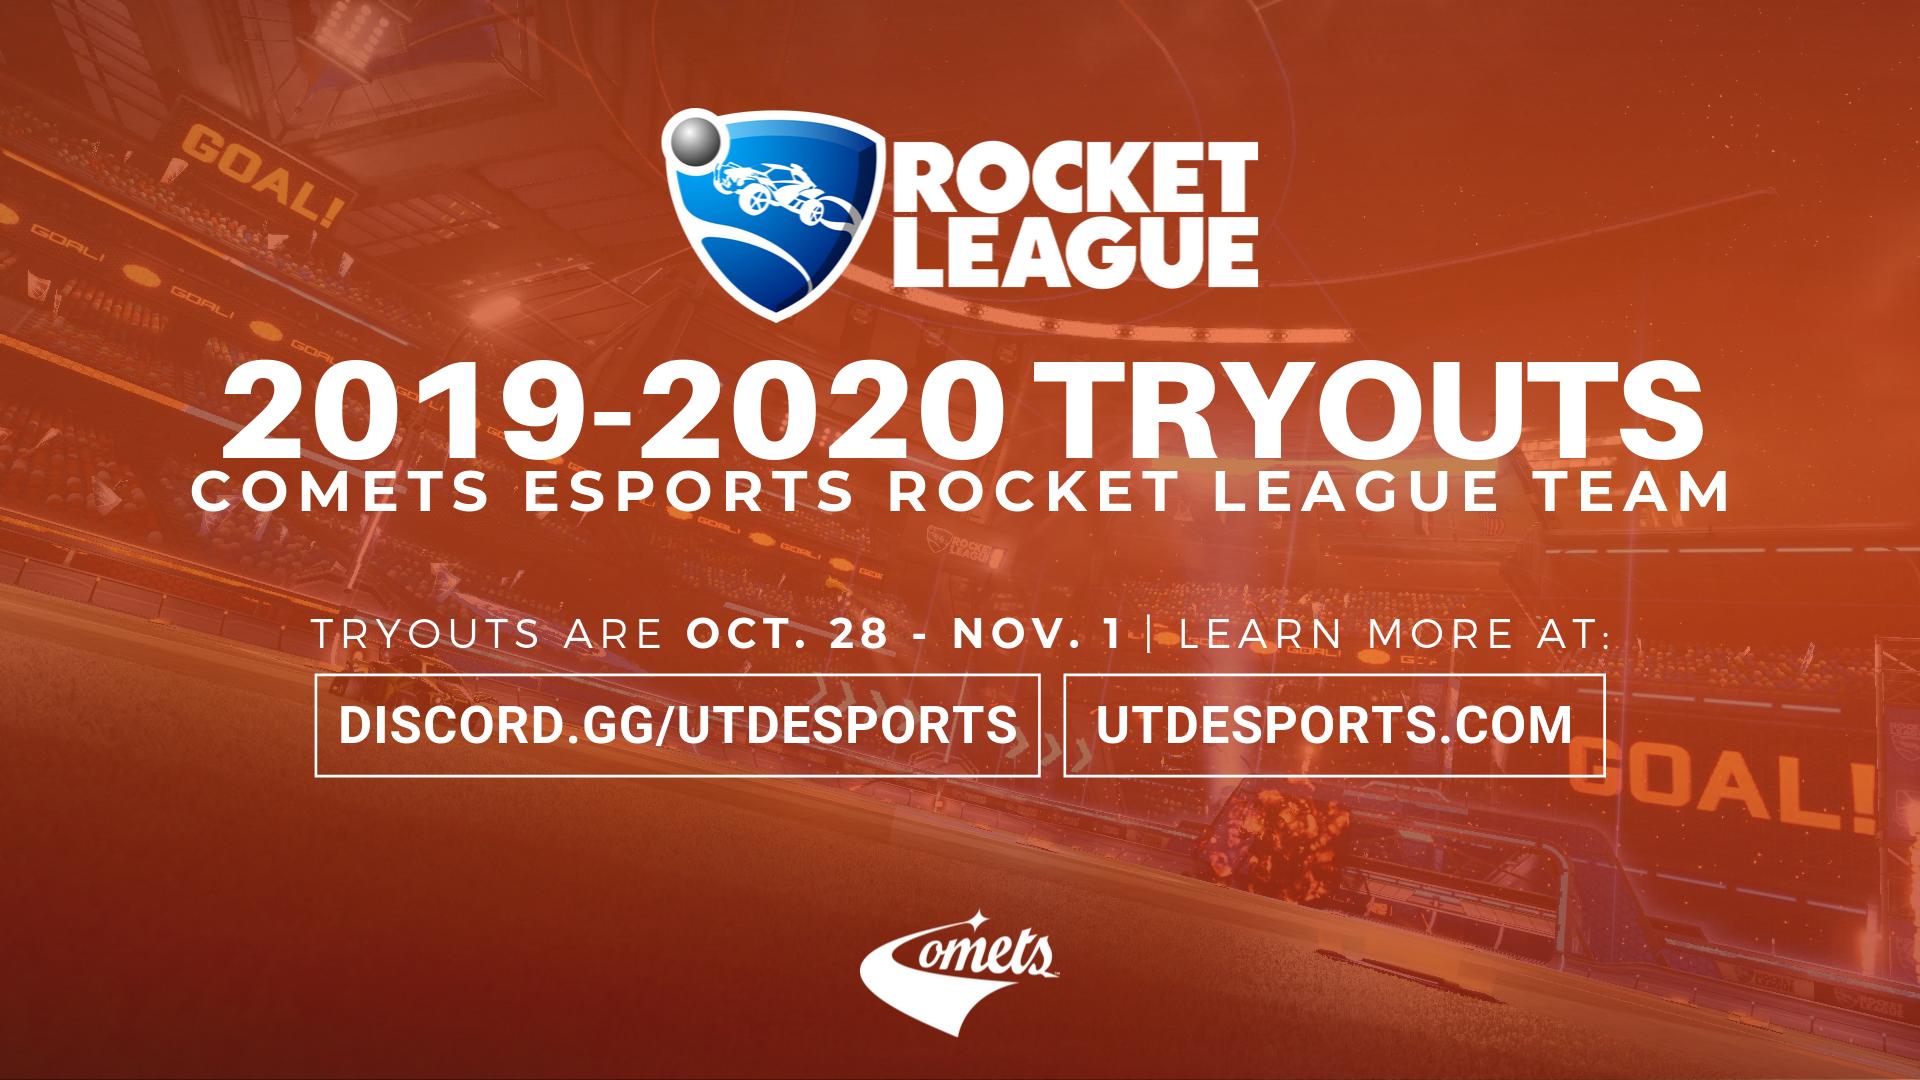 Announcing The 4th Comets Esports Team: Rocket League!